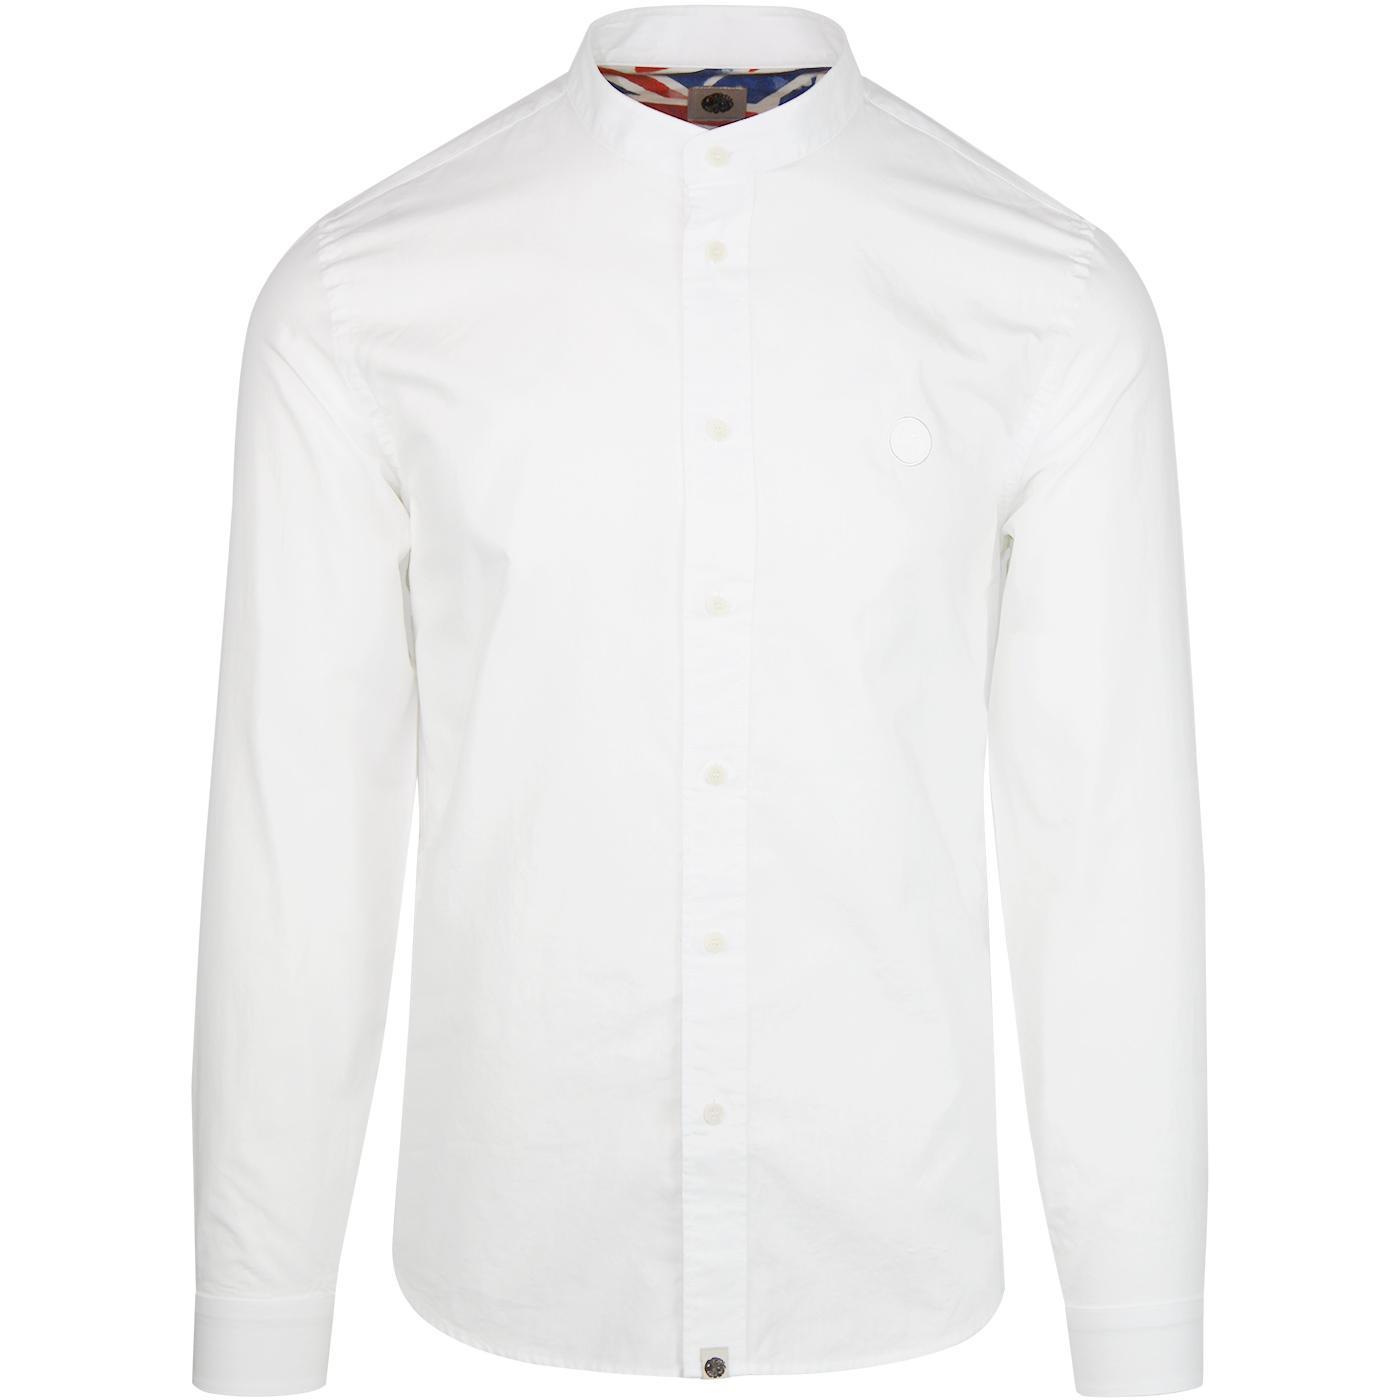 PRETTY GREEN 1960s Mod Grandad Collar Shirt WHITE